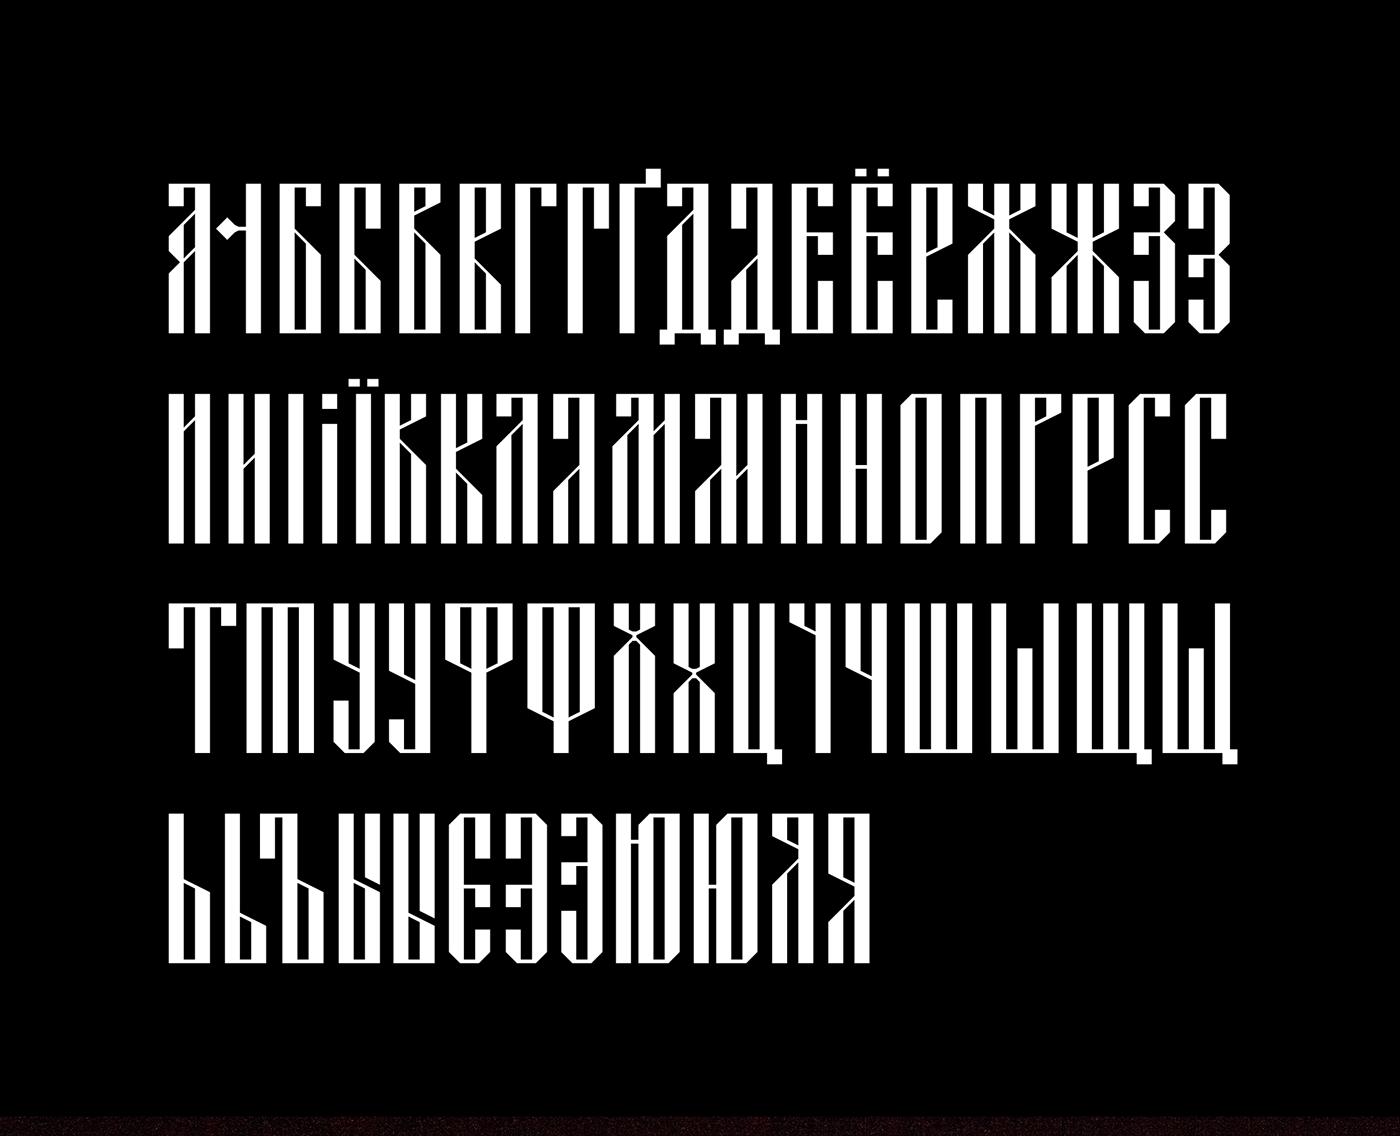 Cyrillic,Latin,font,Script,techno,modern,poster,encrypted,pattern,free